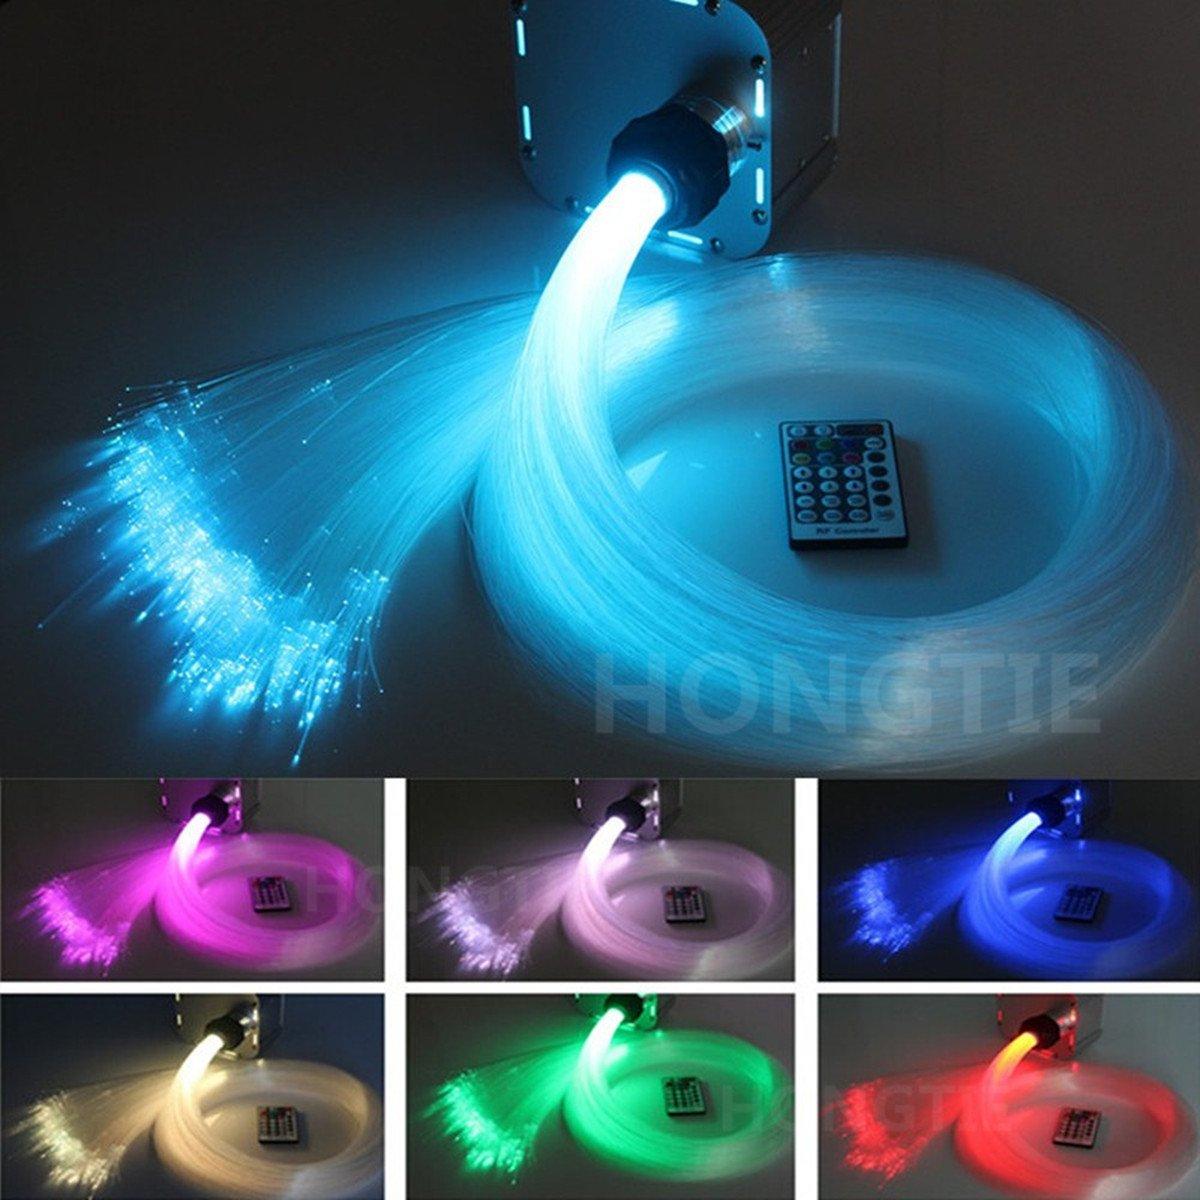 HongTie 32W RGB 4 speed Twinkle LED Fiber Optic star ceiling Ceiling Kit Light 800Pcs 0.75mm 4m